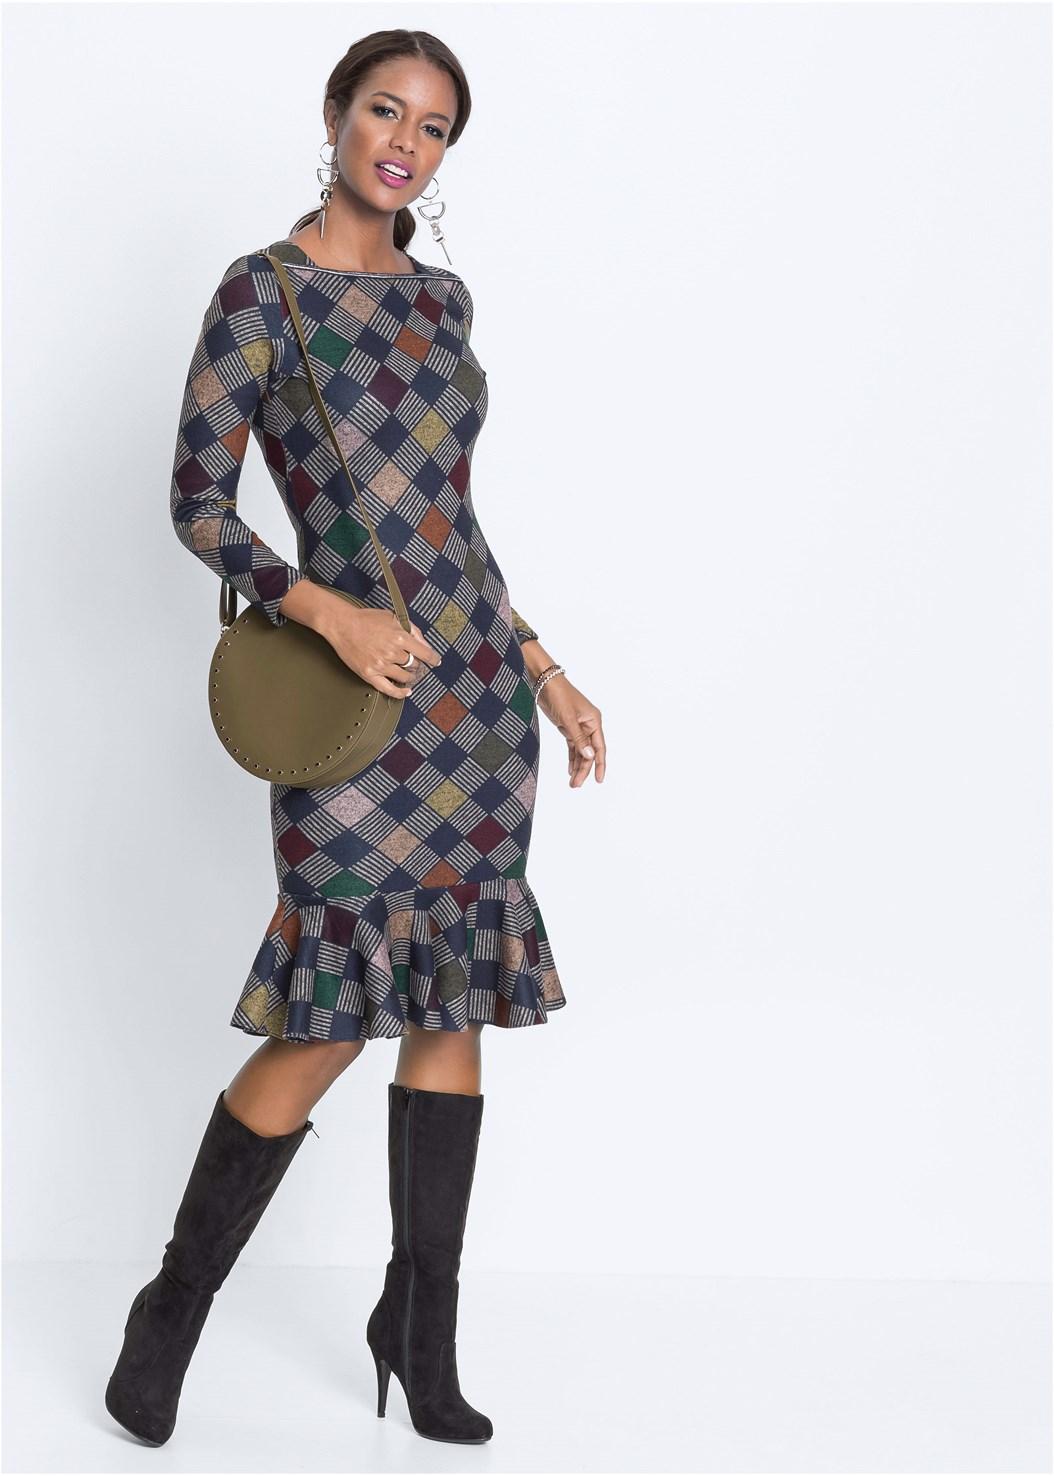 Diamond Print Midi Dress,Over The Knee Stretch Boots